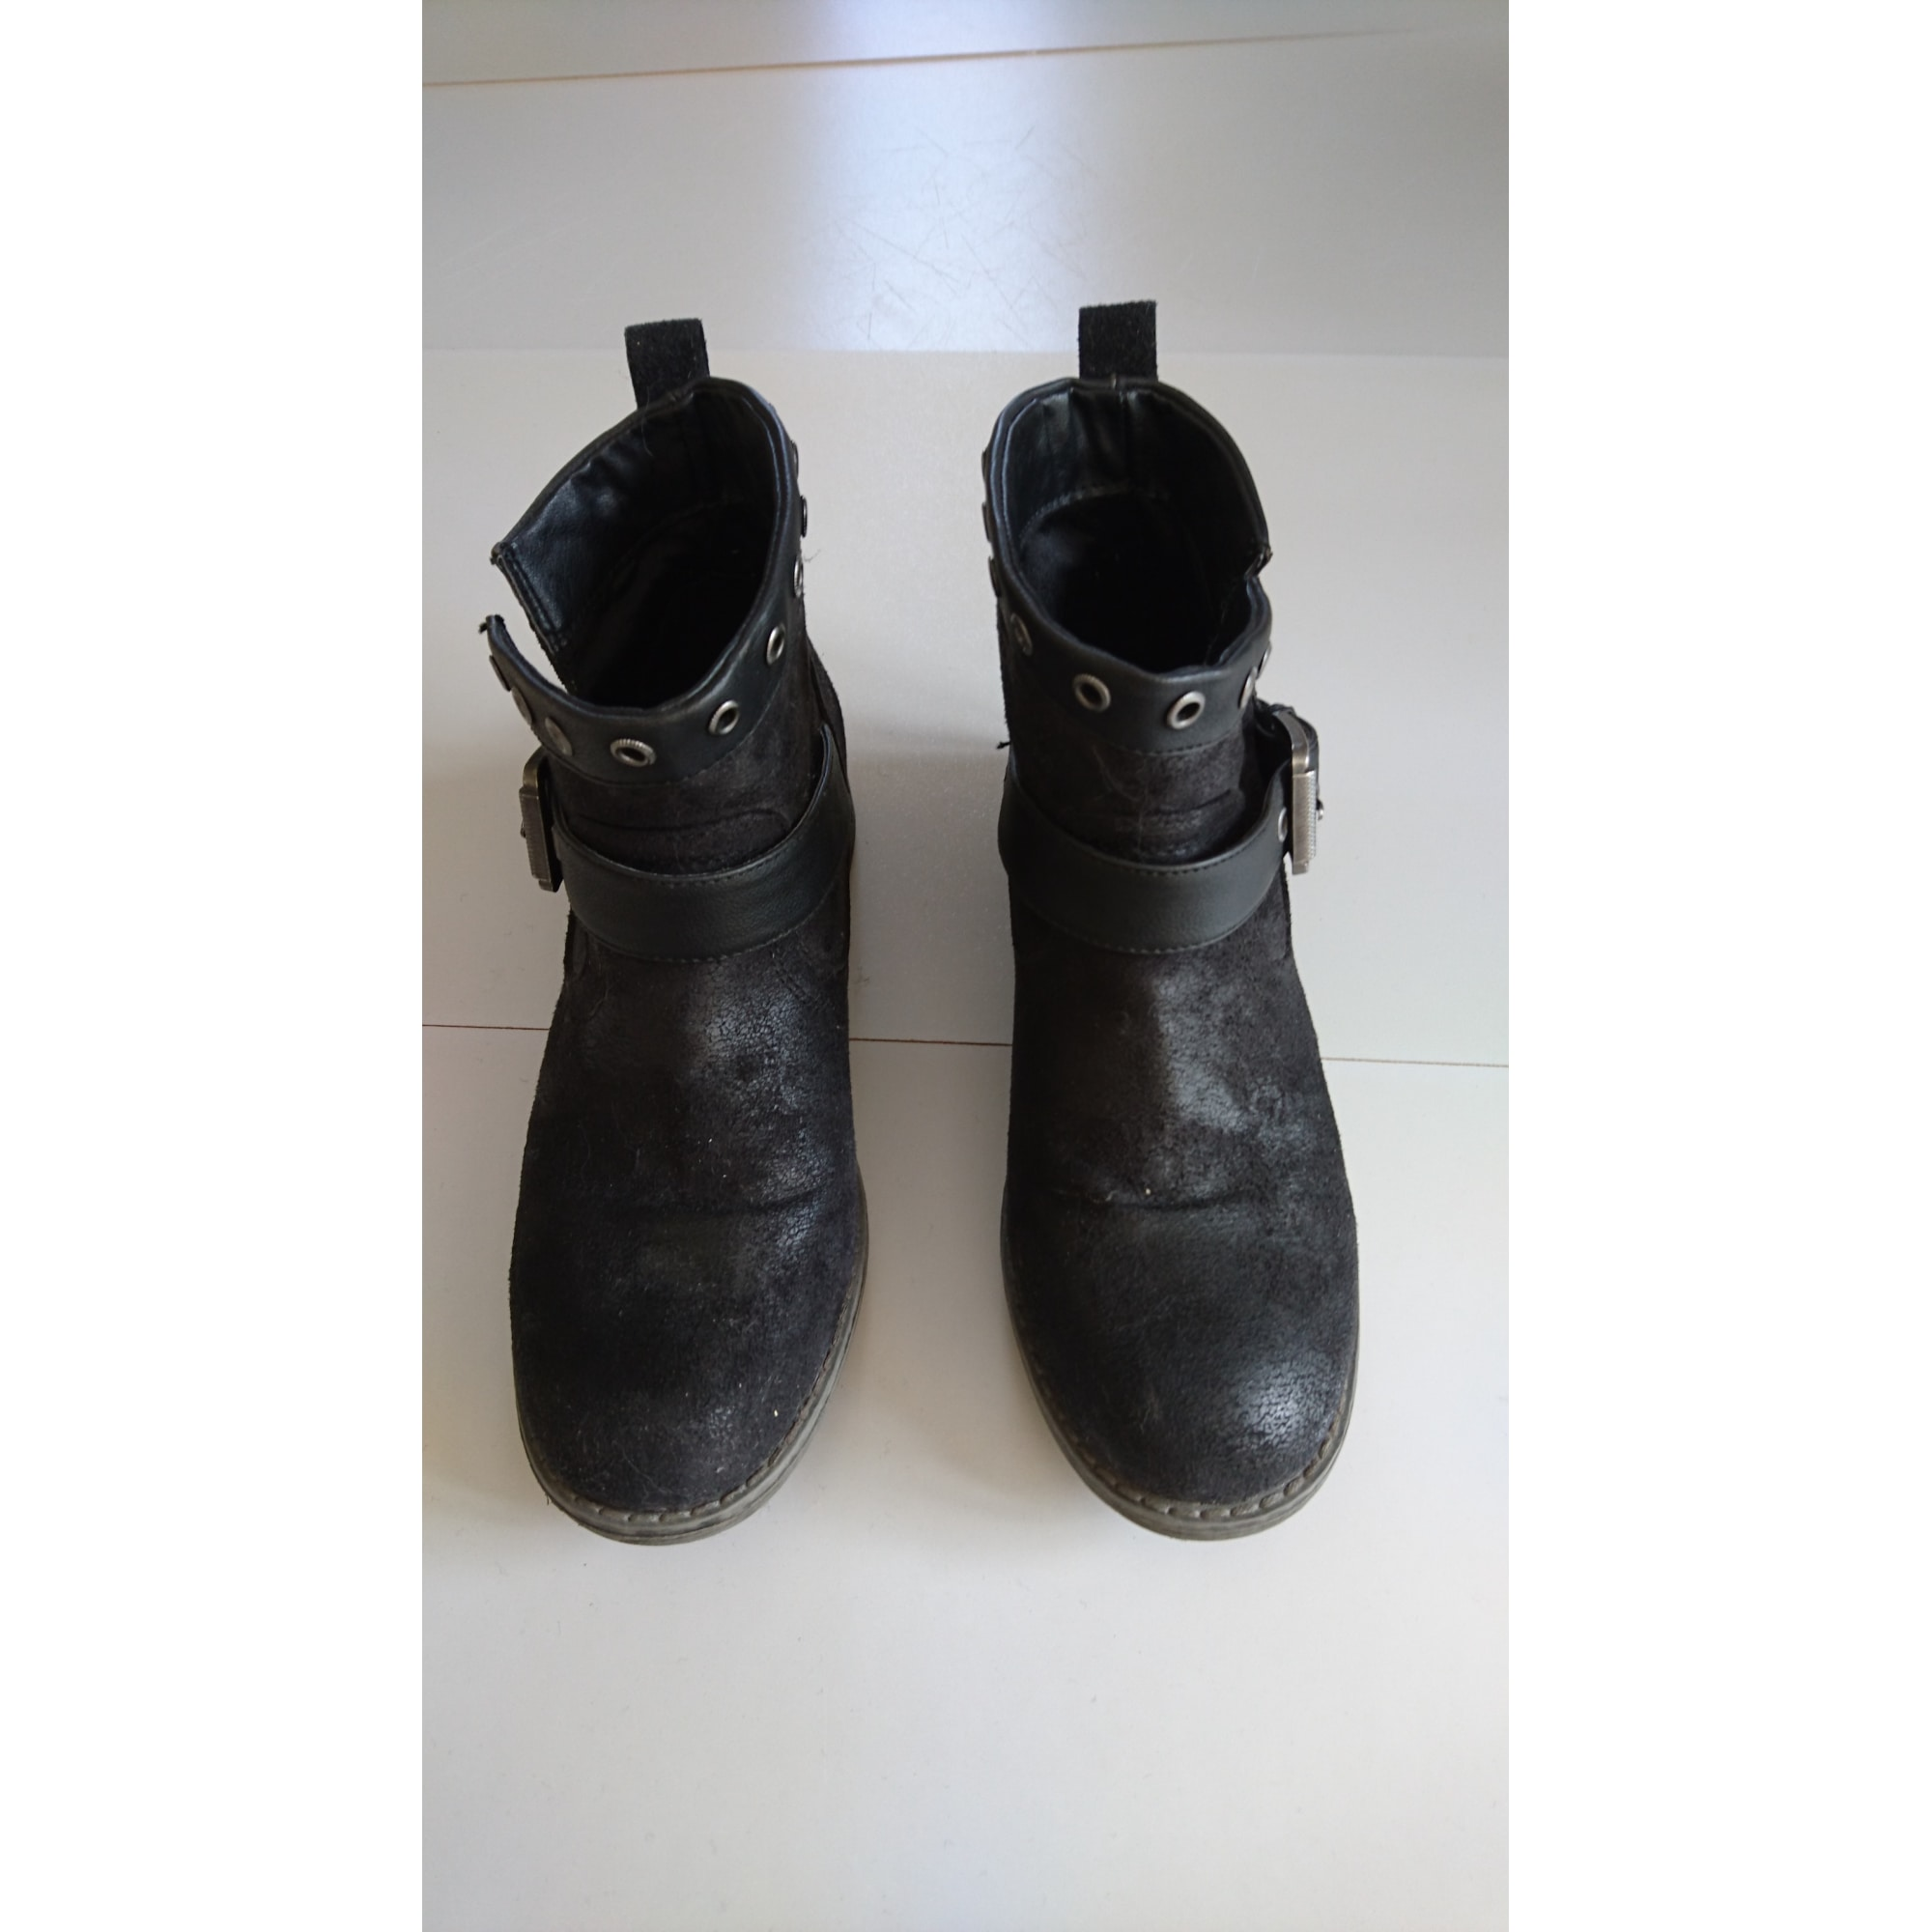 08e89867a46 Bottines   low boots plates TEXTO CHAUSSURE 38 noir - 6399537